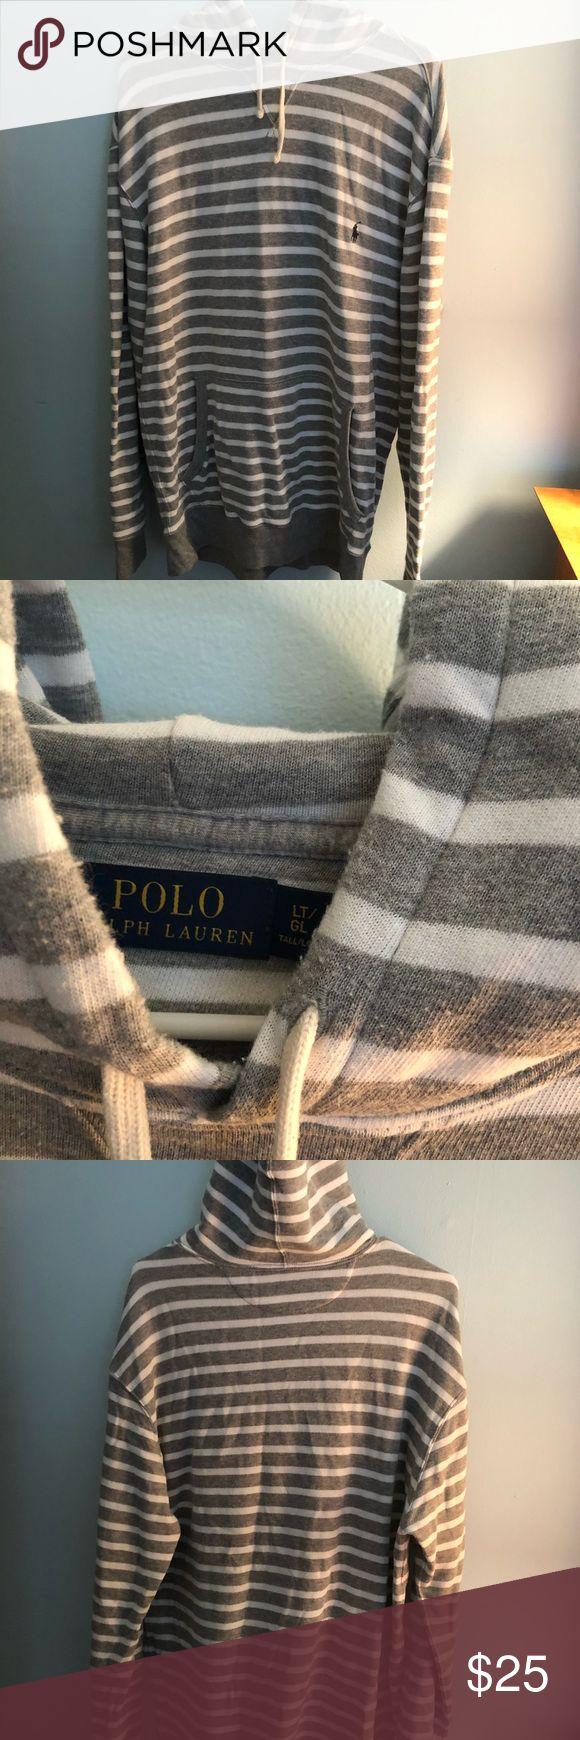 Men's striped polo Ralph Lauren hoodie Men's gray striped polo Ralph Lauren hoodie, worn a few times but in great condition. Polo by Ralph Lauren Shirts Sweatshirts & Hoodies